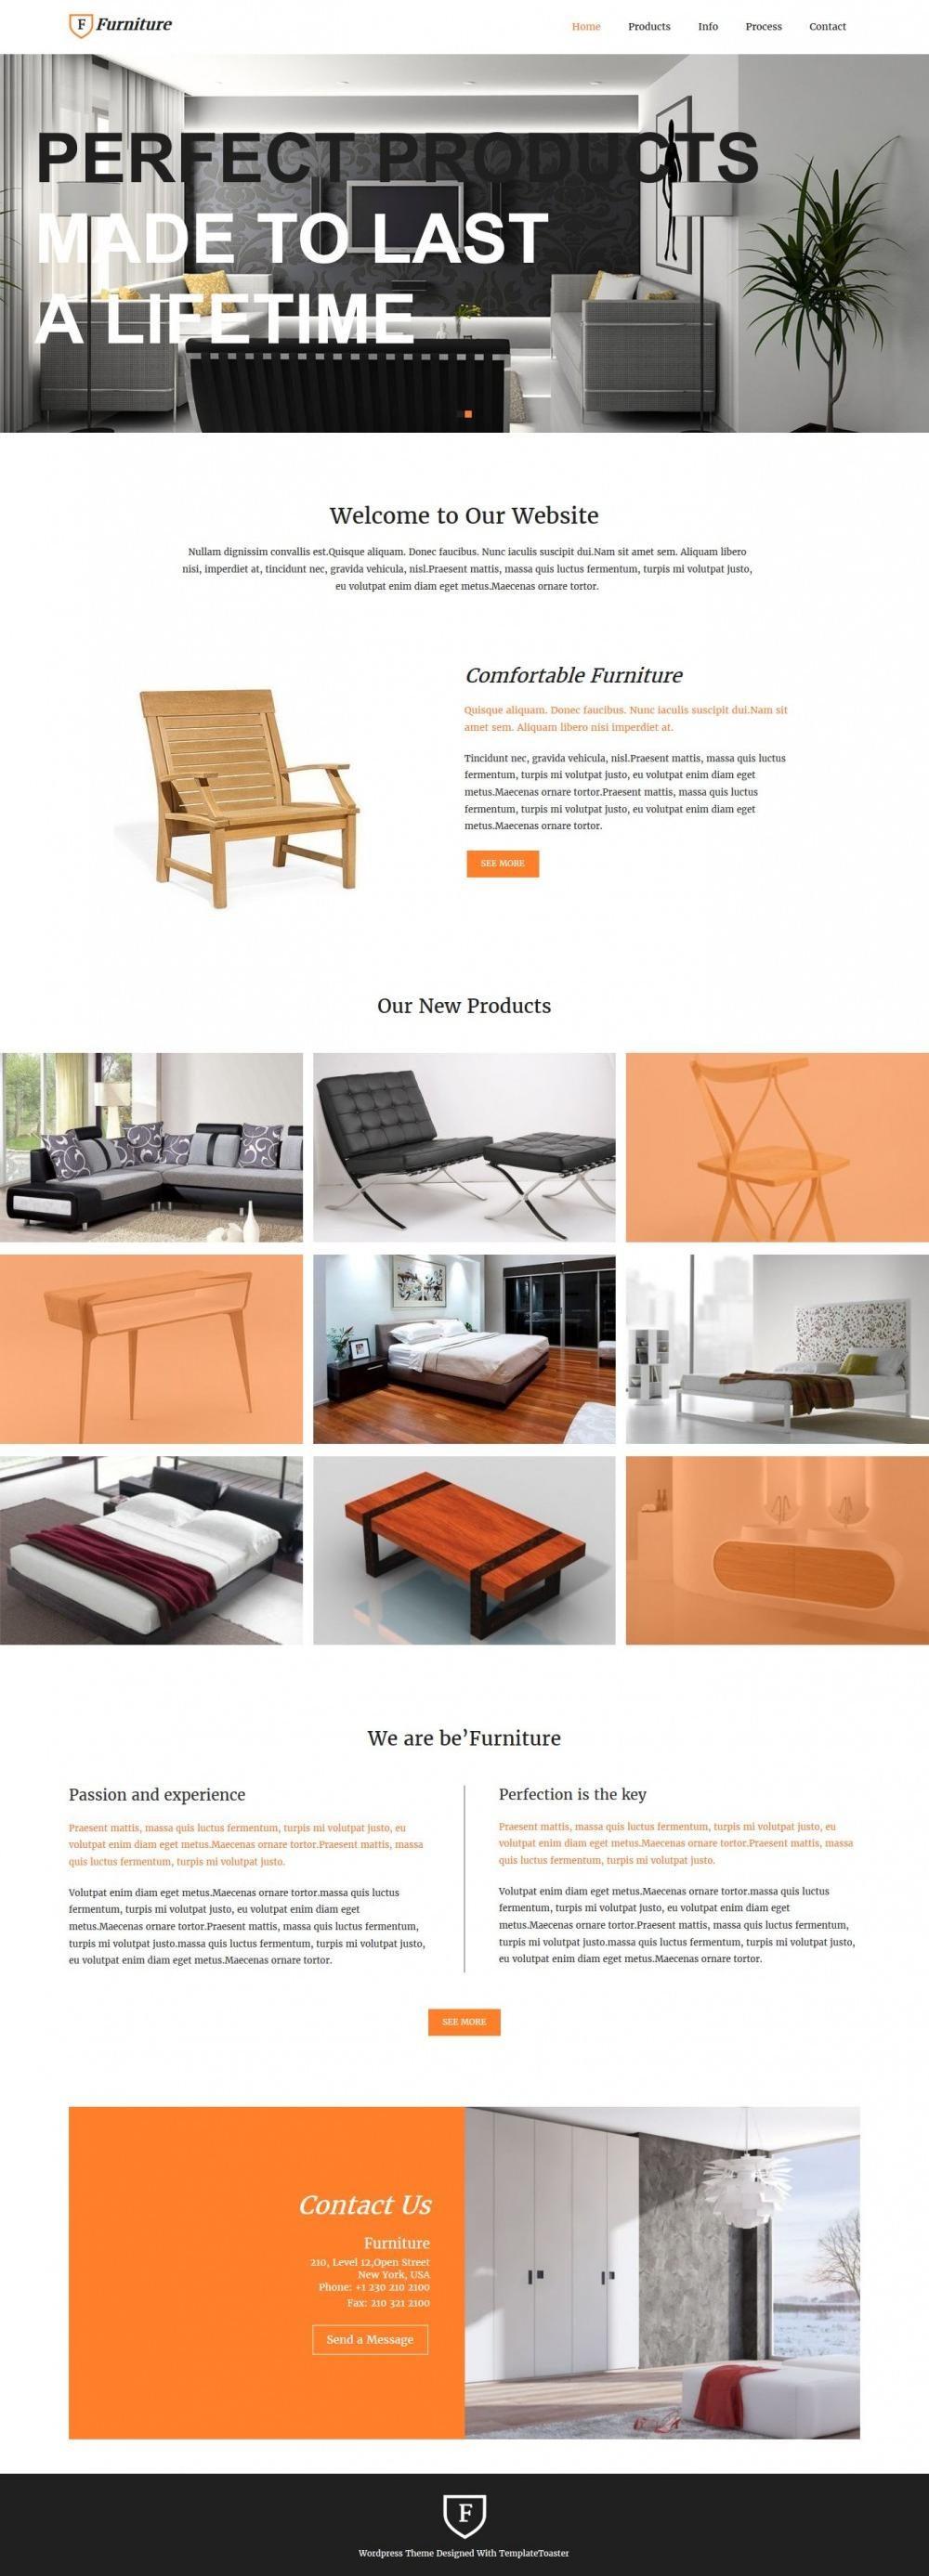 Furniture - WordPress theme for Furniture Enterprises